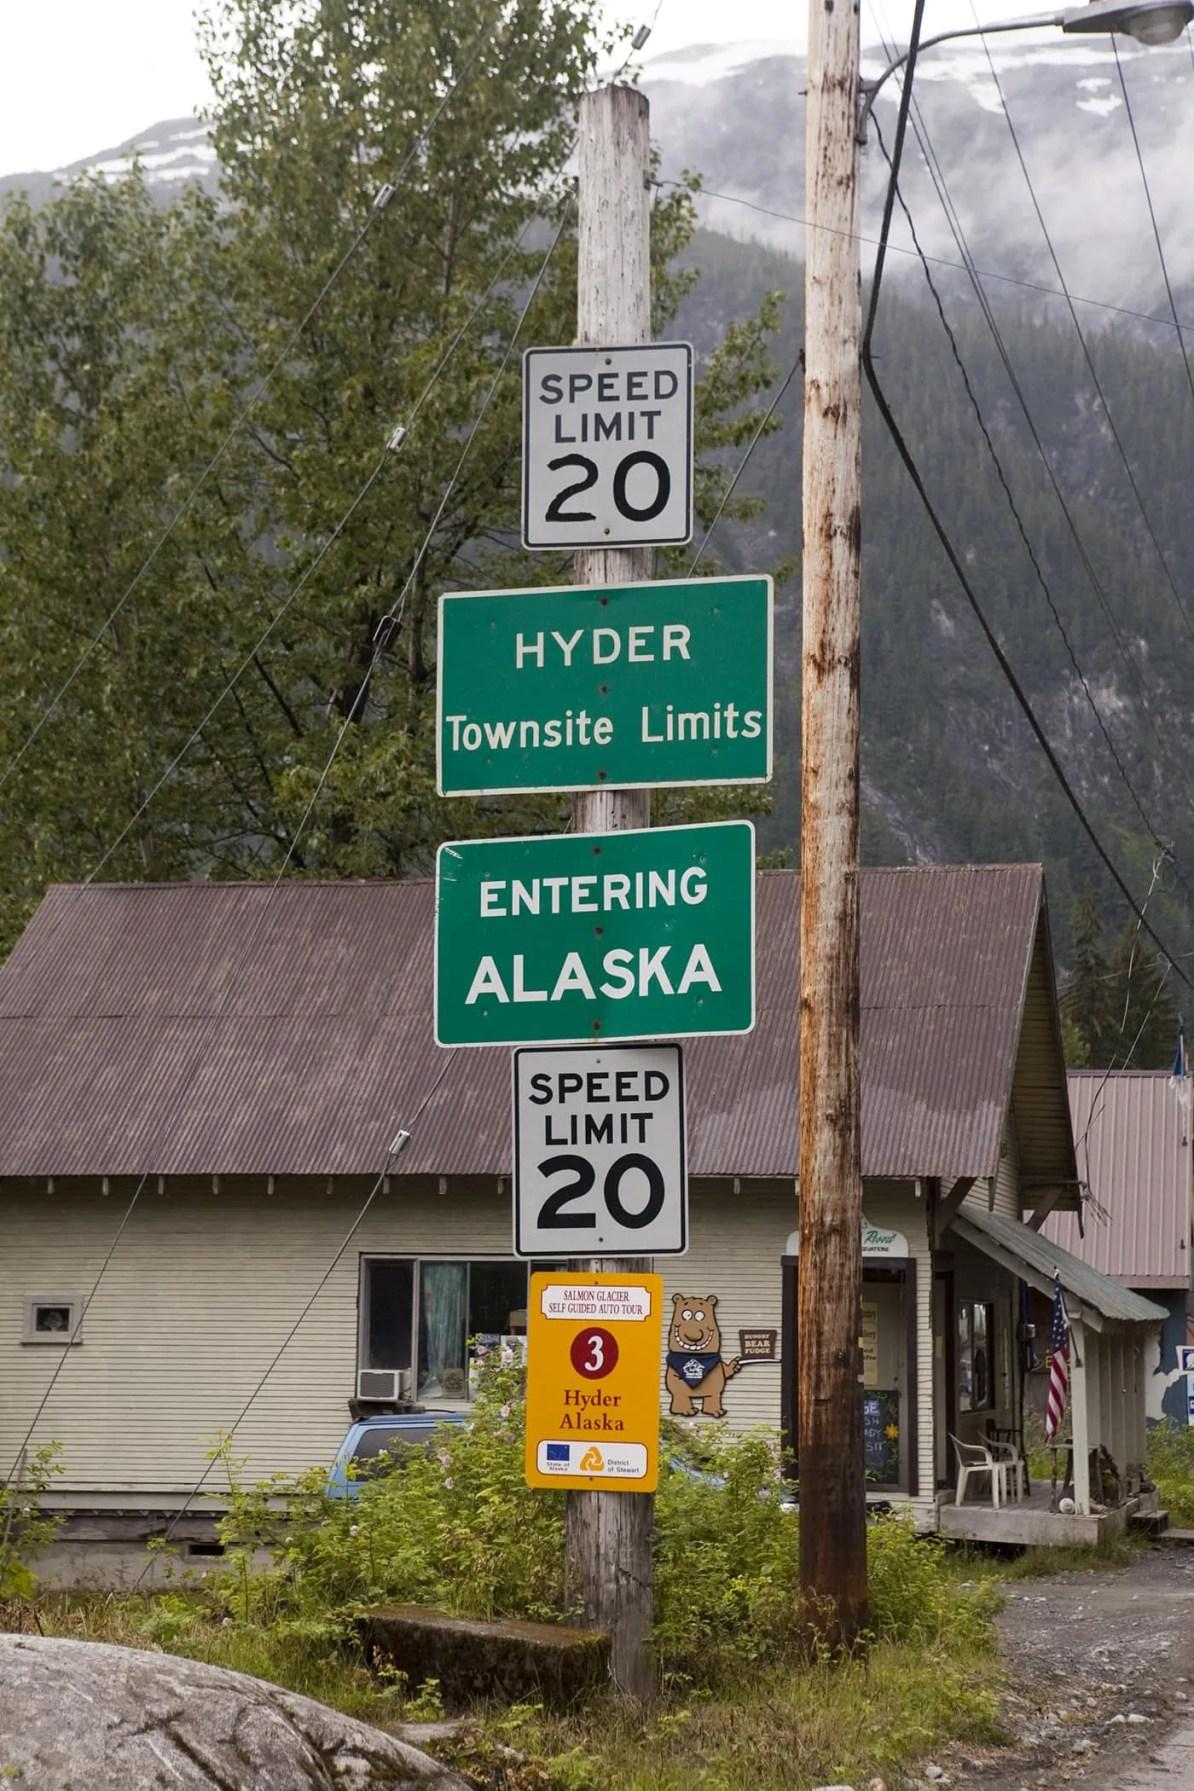 Entering Alaska sign at the border between Canada and Hyder, Alaska.